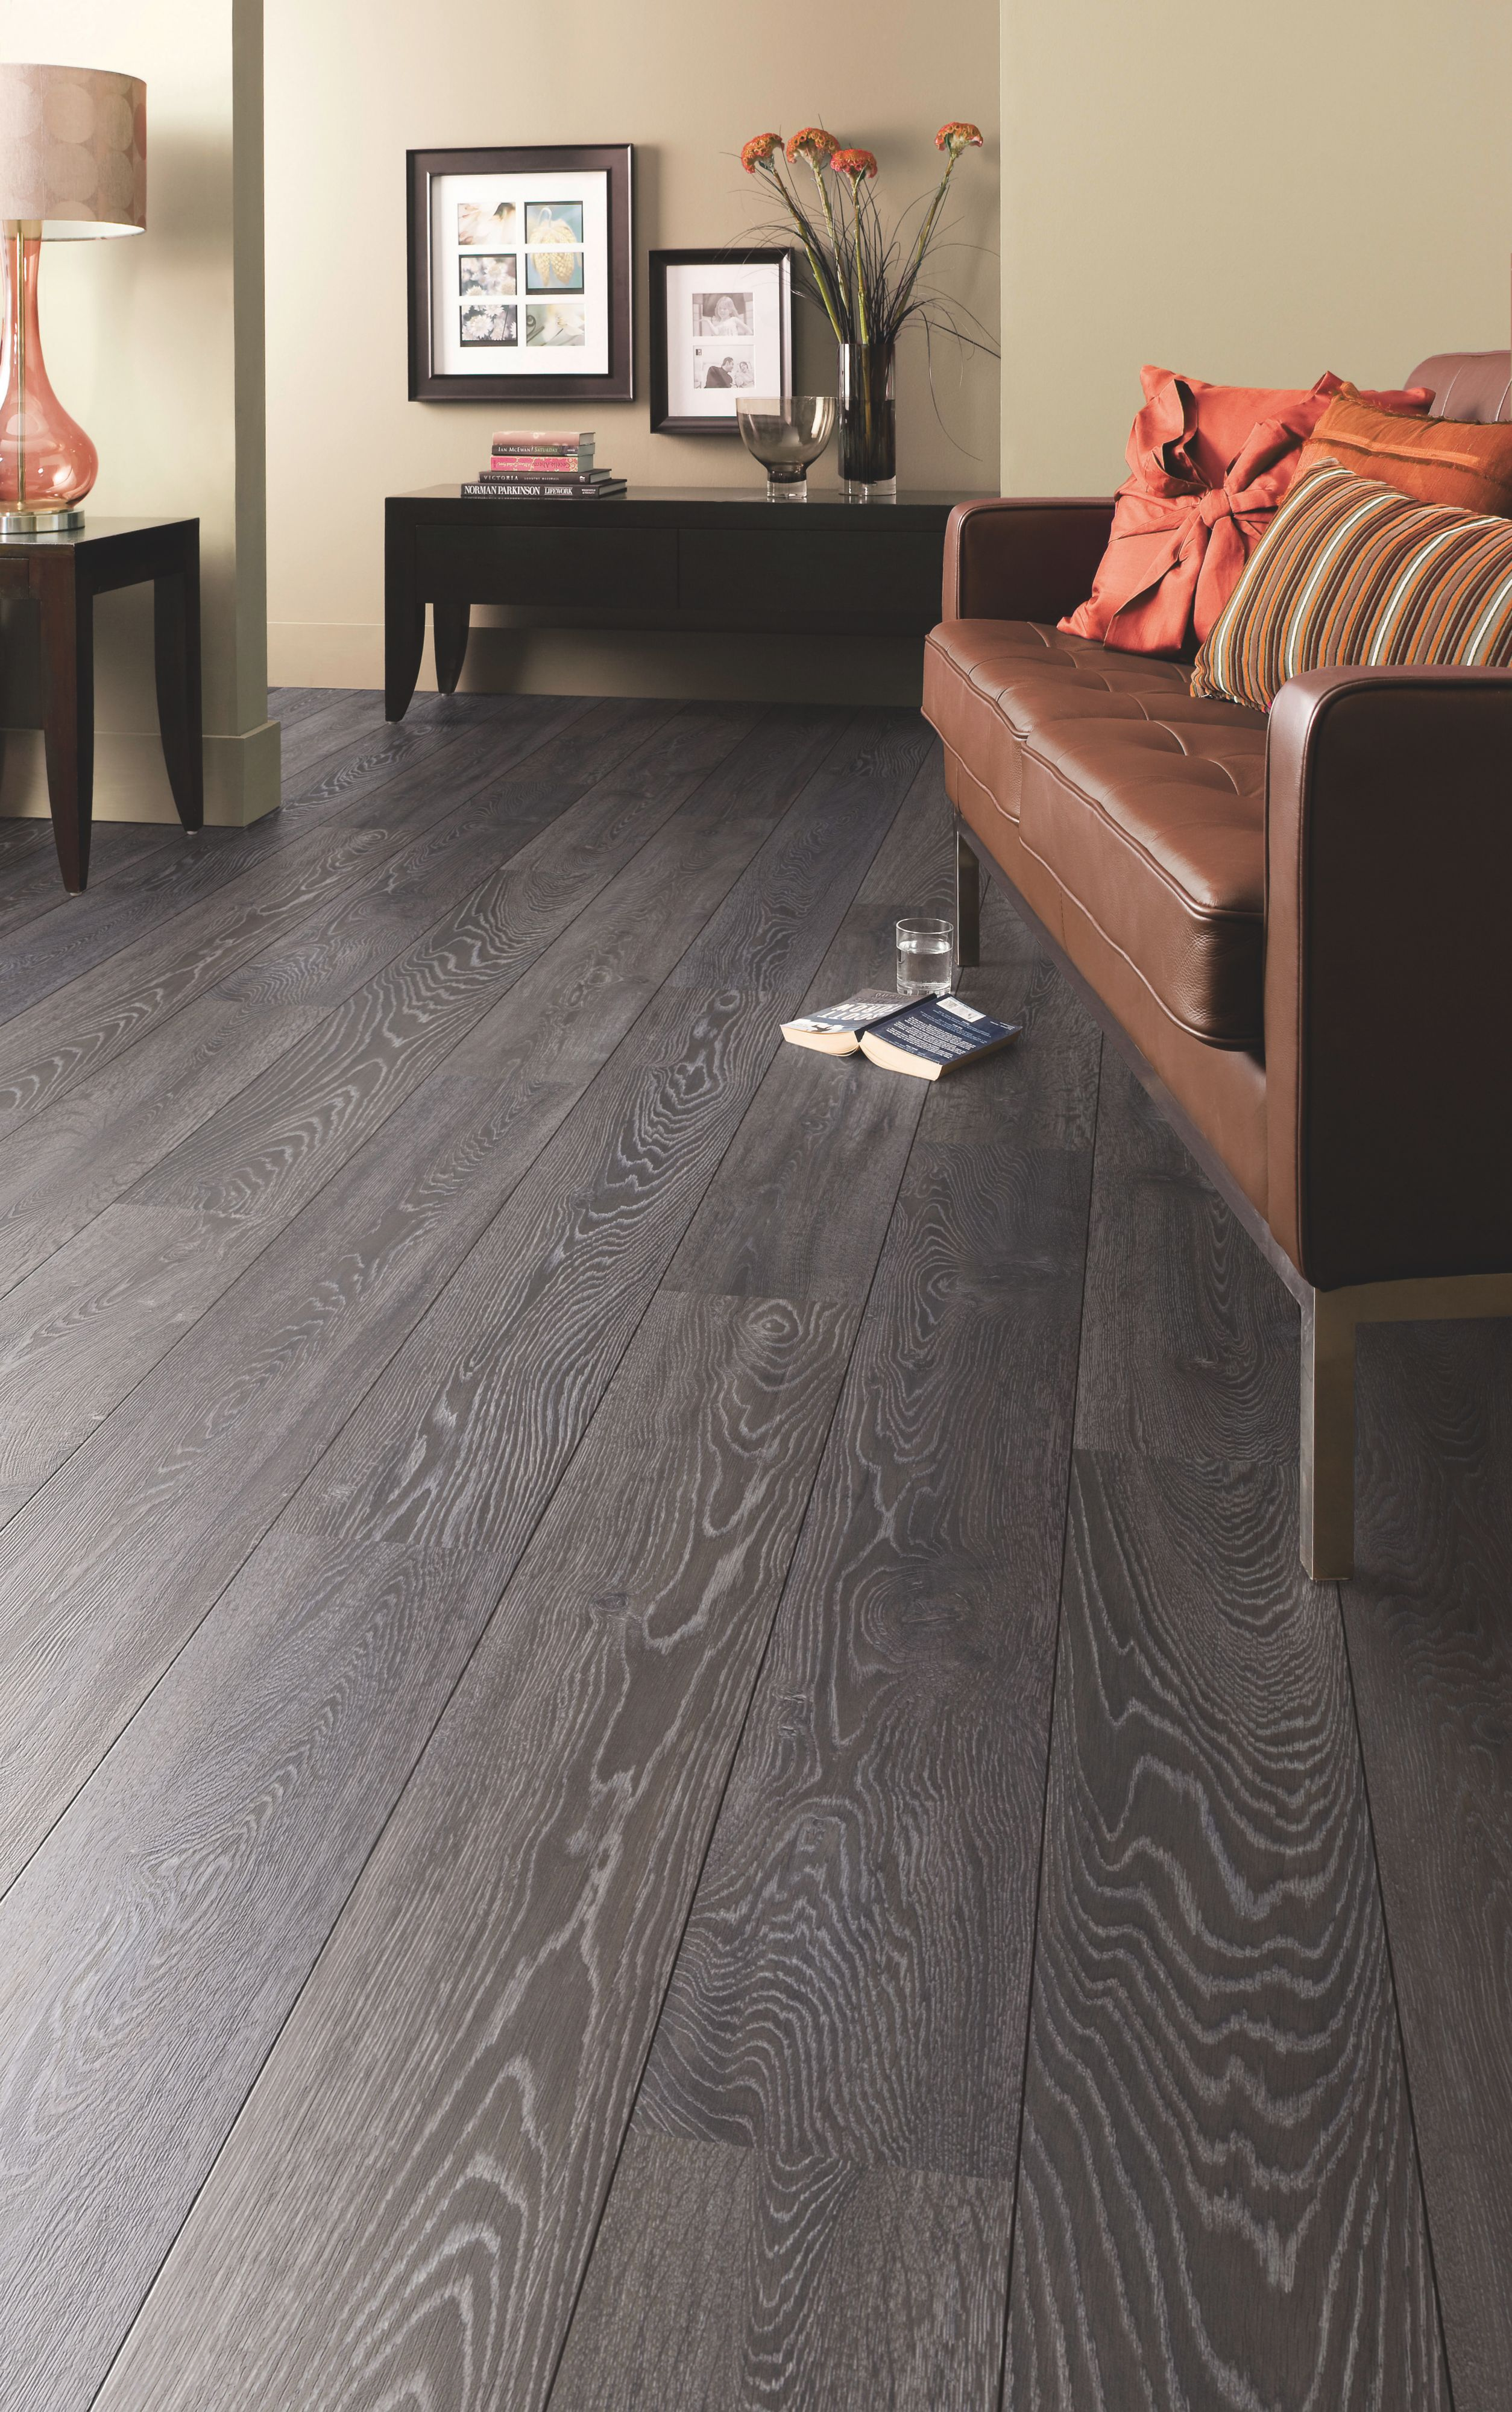 Amadeo Bedrock Oak Effect Authentic Embossed Finish Laminate Flooring 2 22 M² Pack